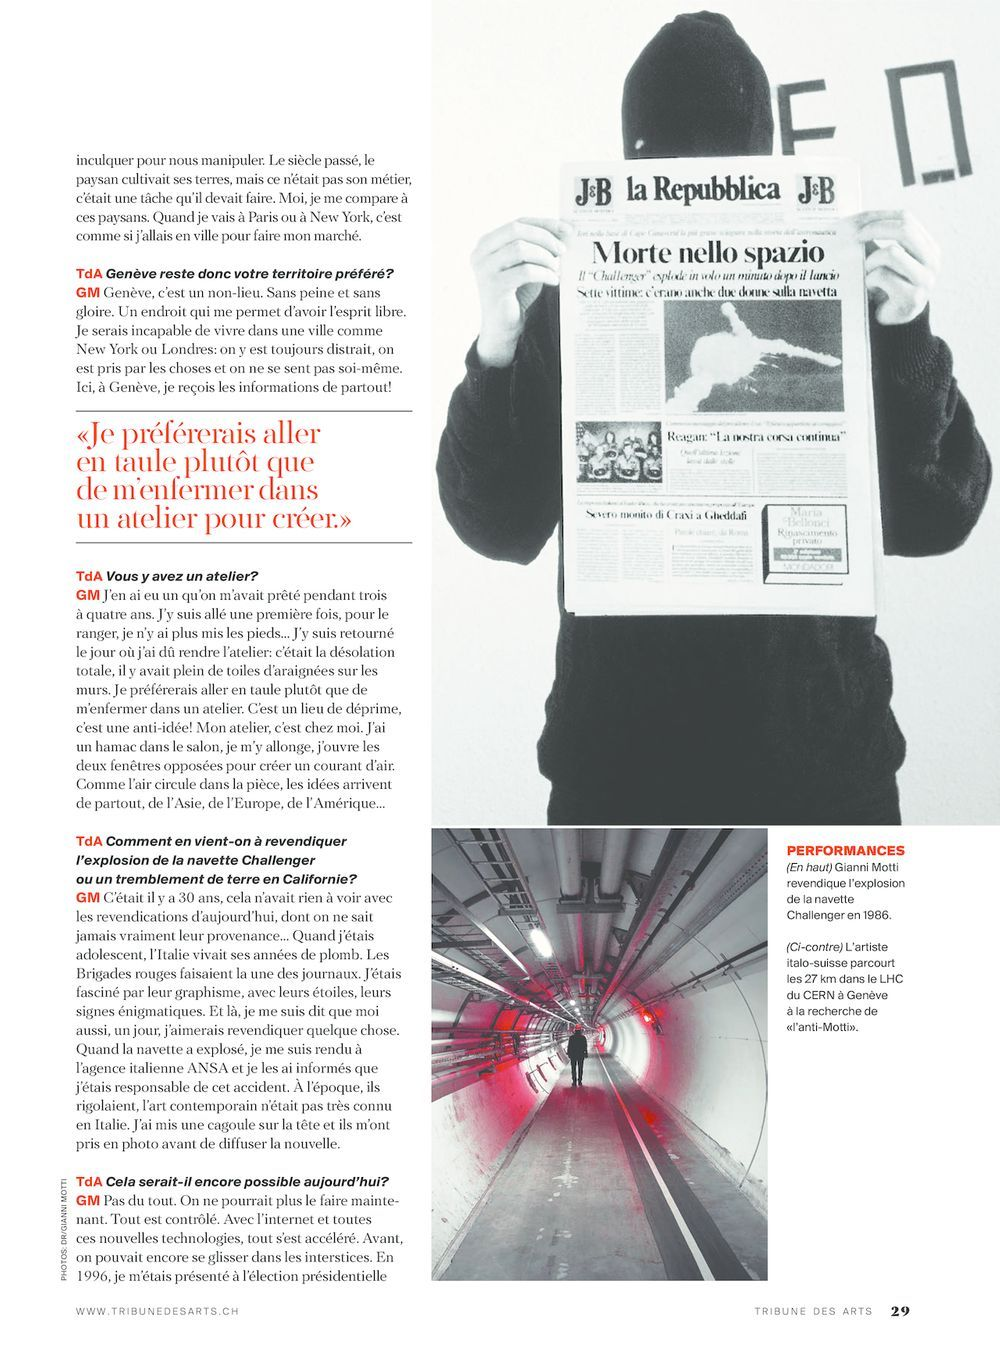 La Tribune des arts   Gianni MOTTI